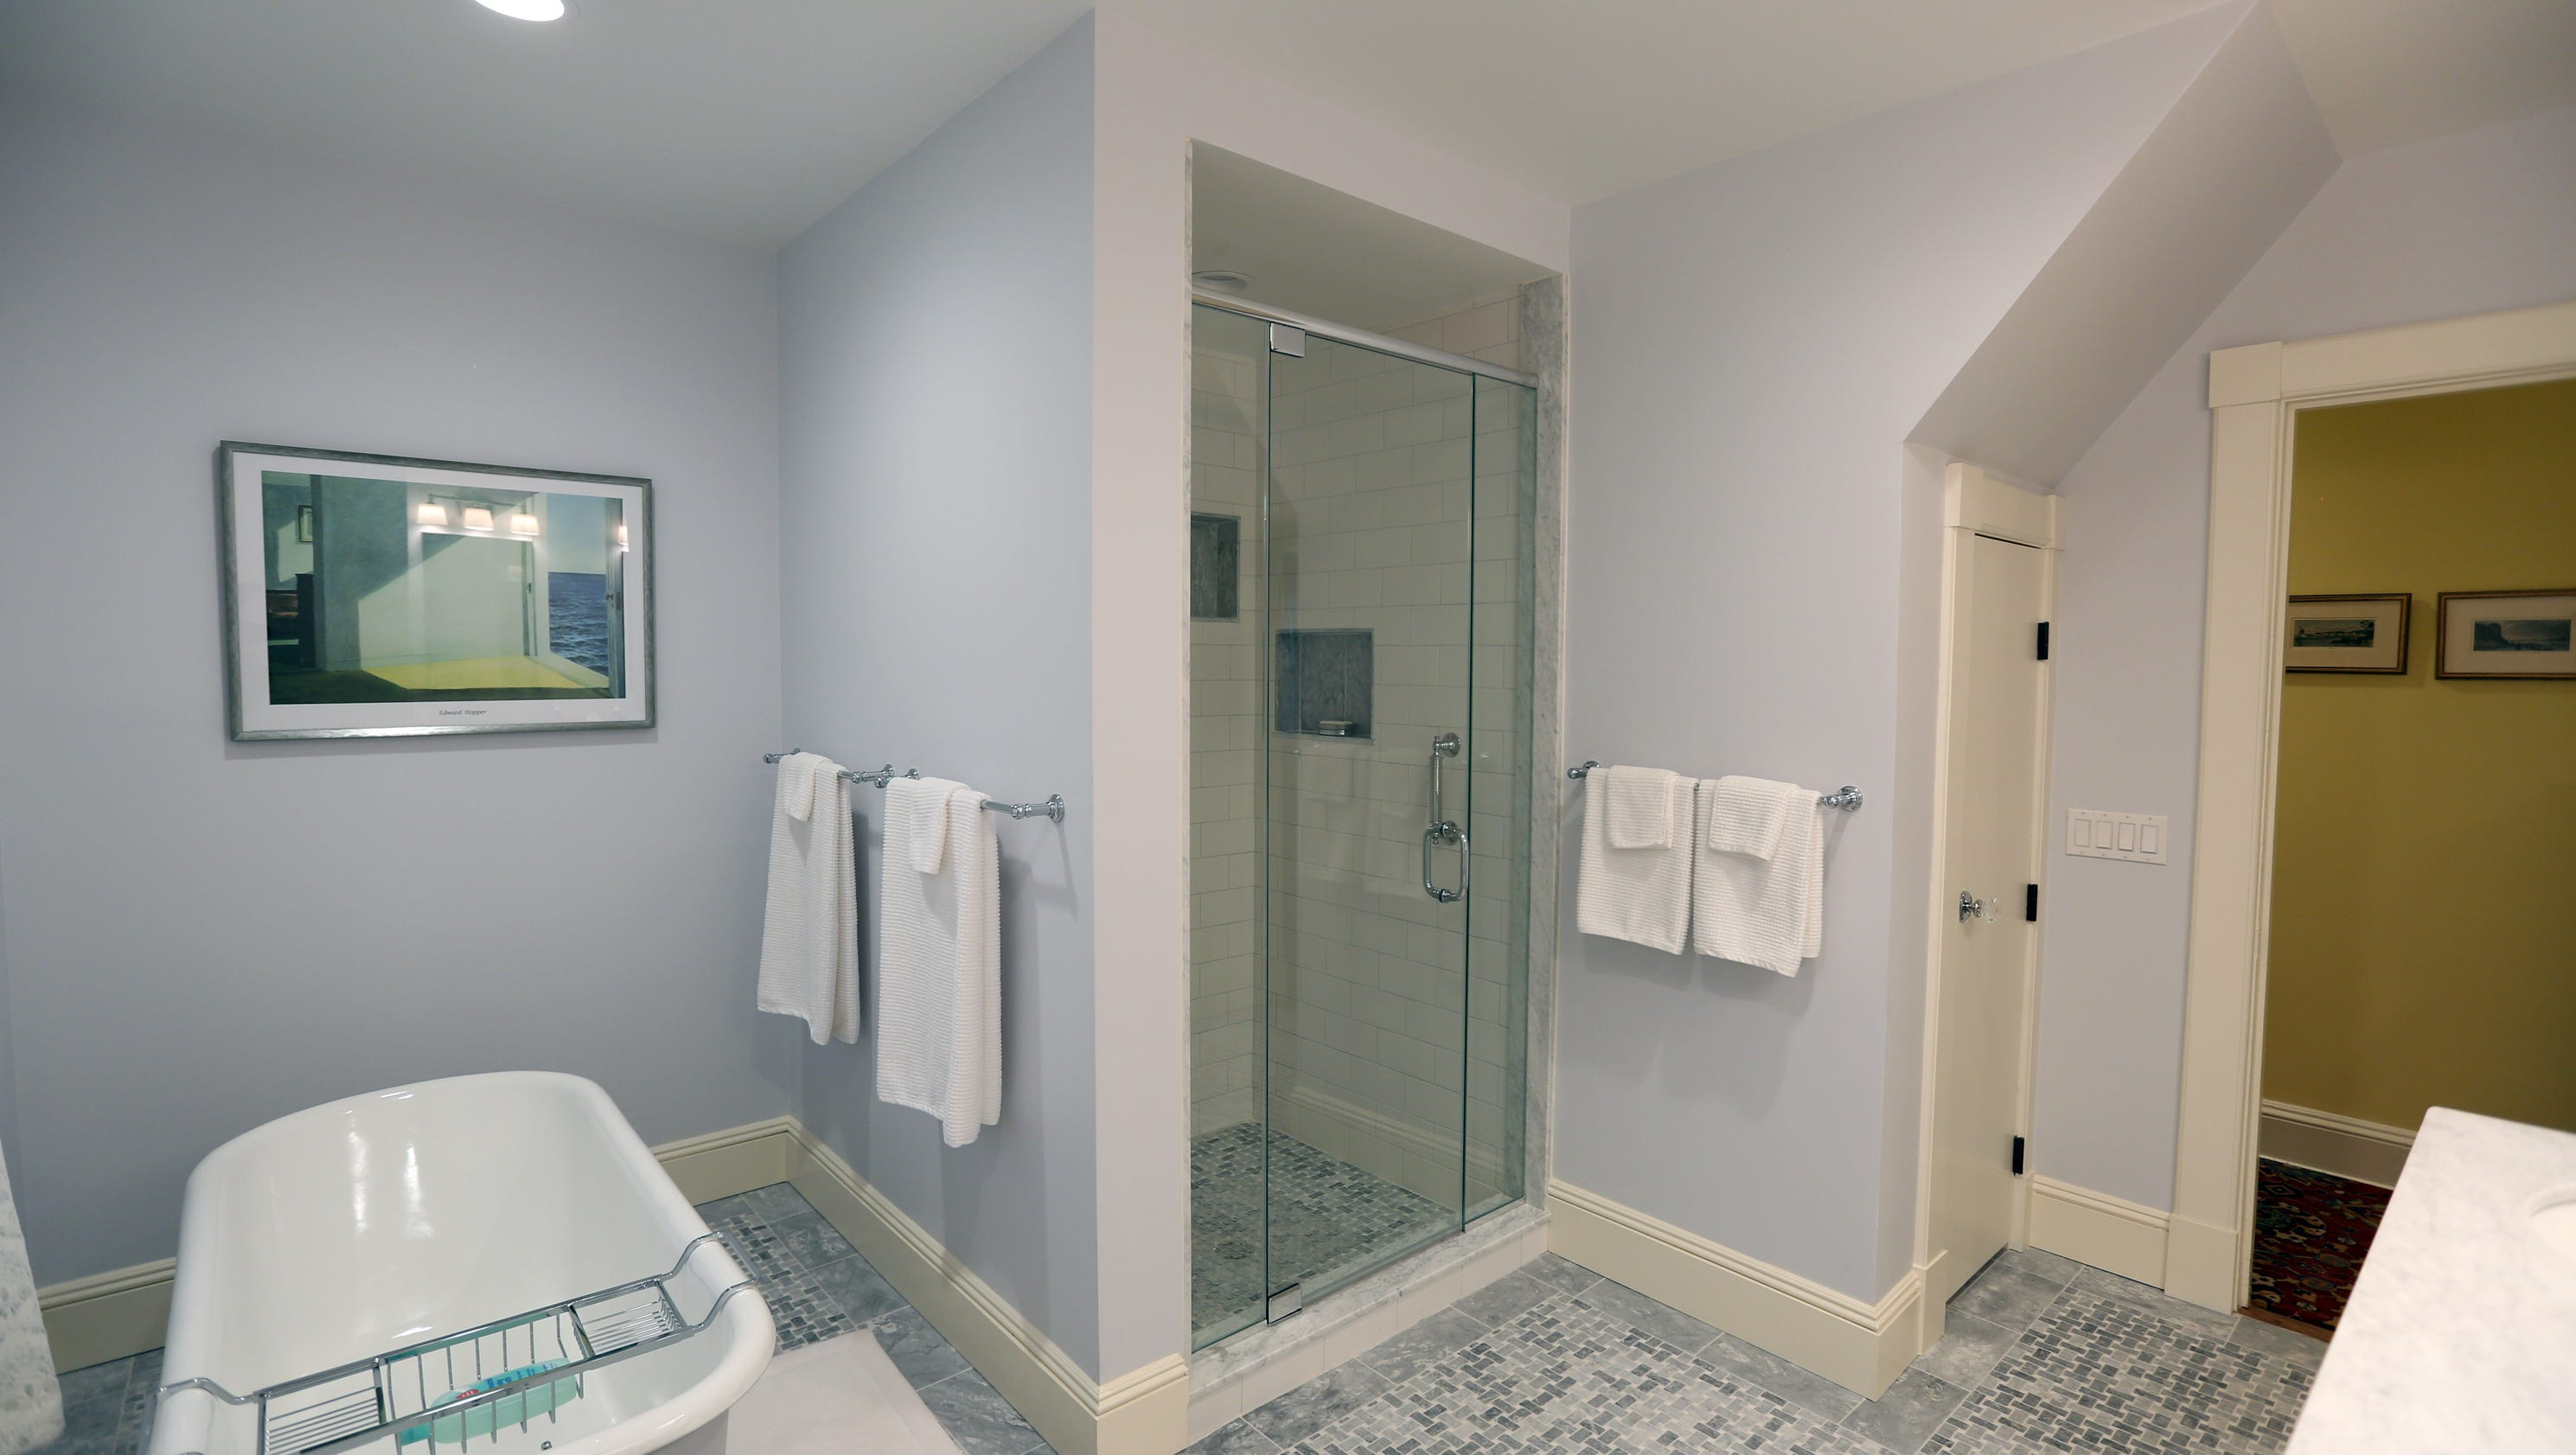 roi: renovating a 1999 bathroom a good idea